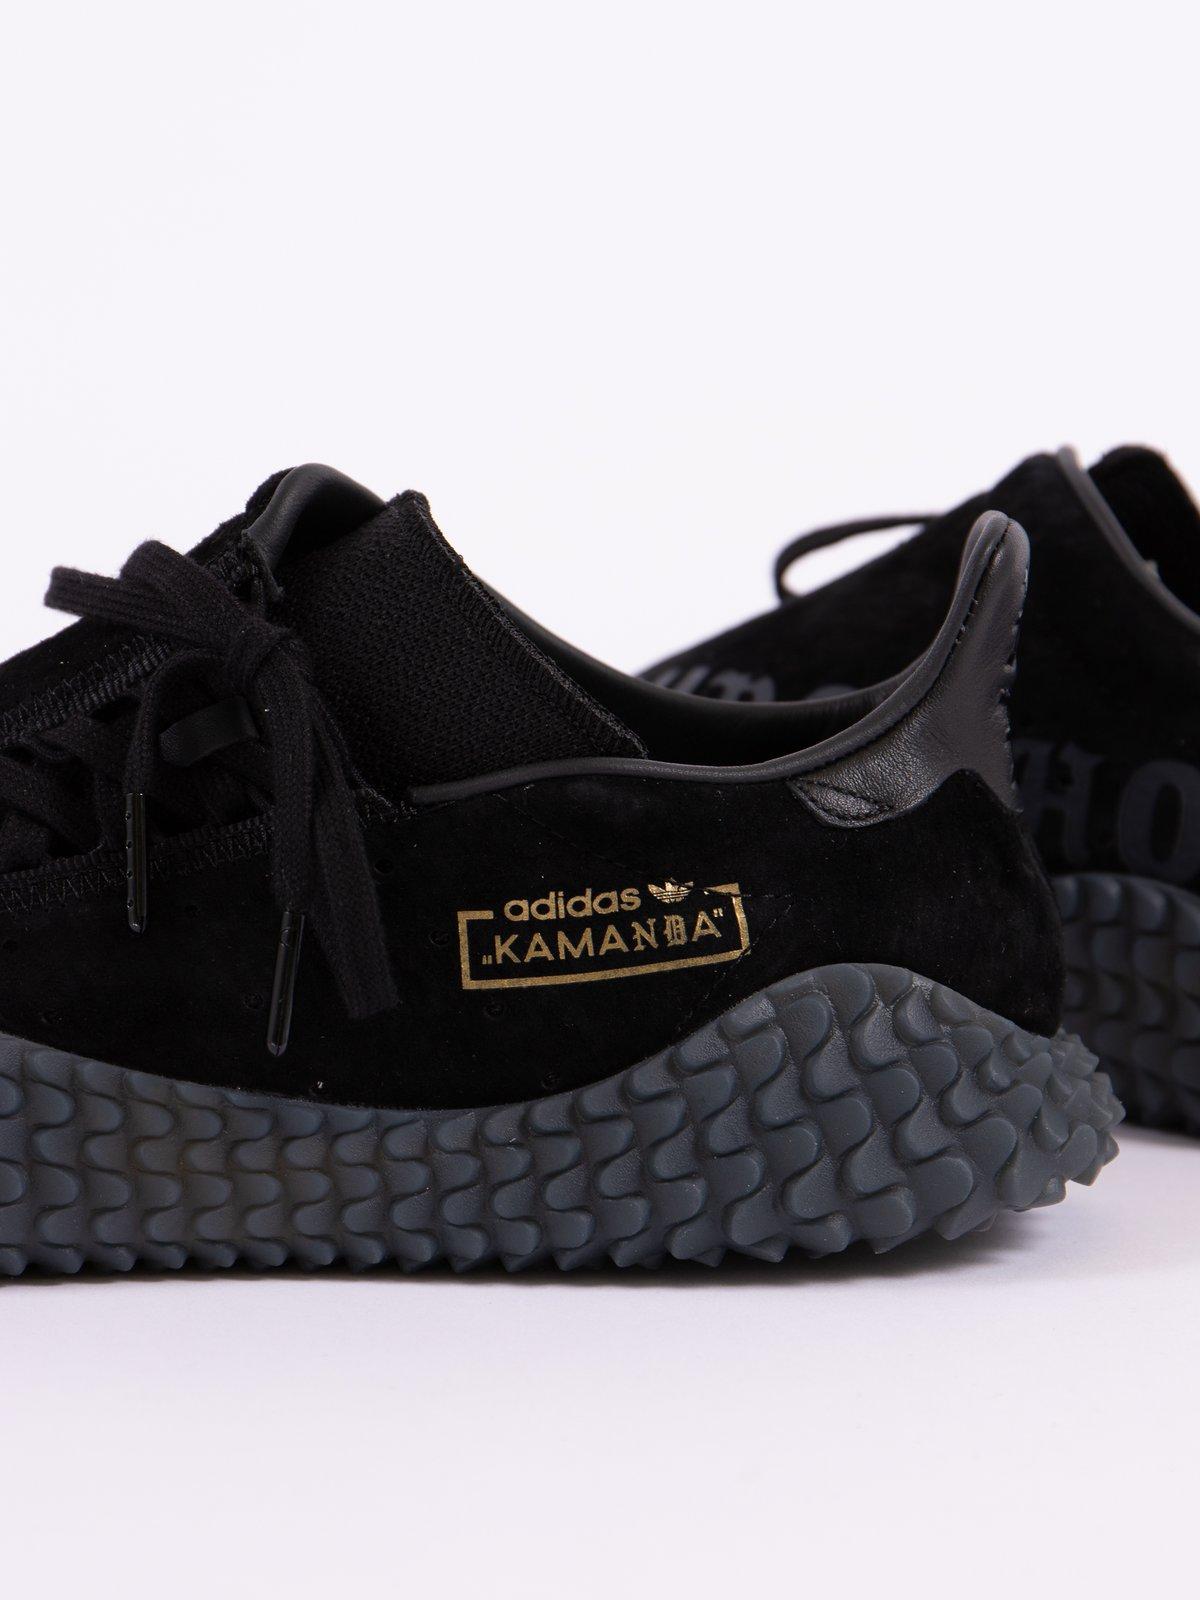 Black Kamanda 01 NBHD - Image 5